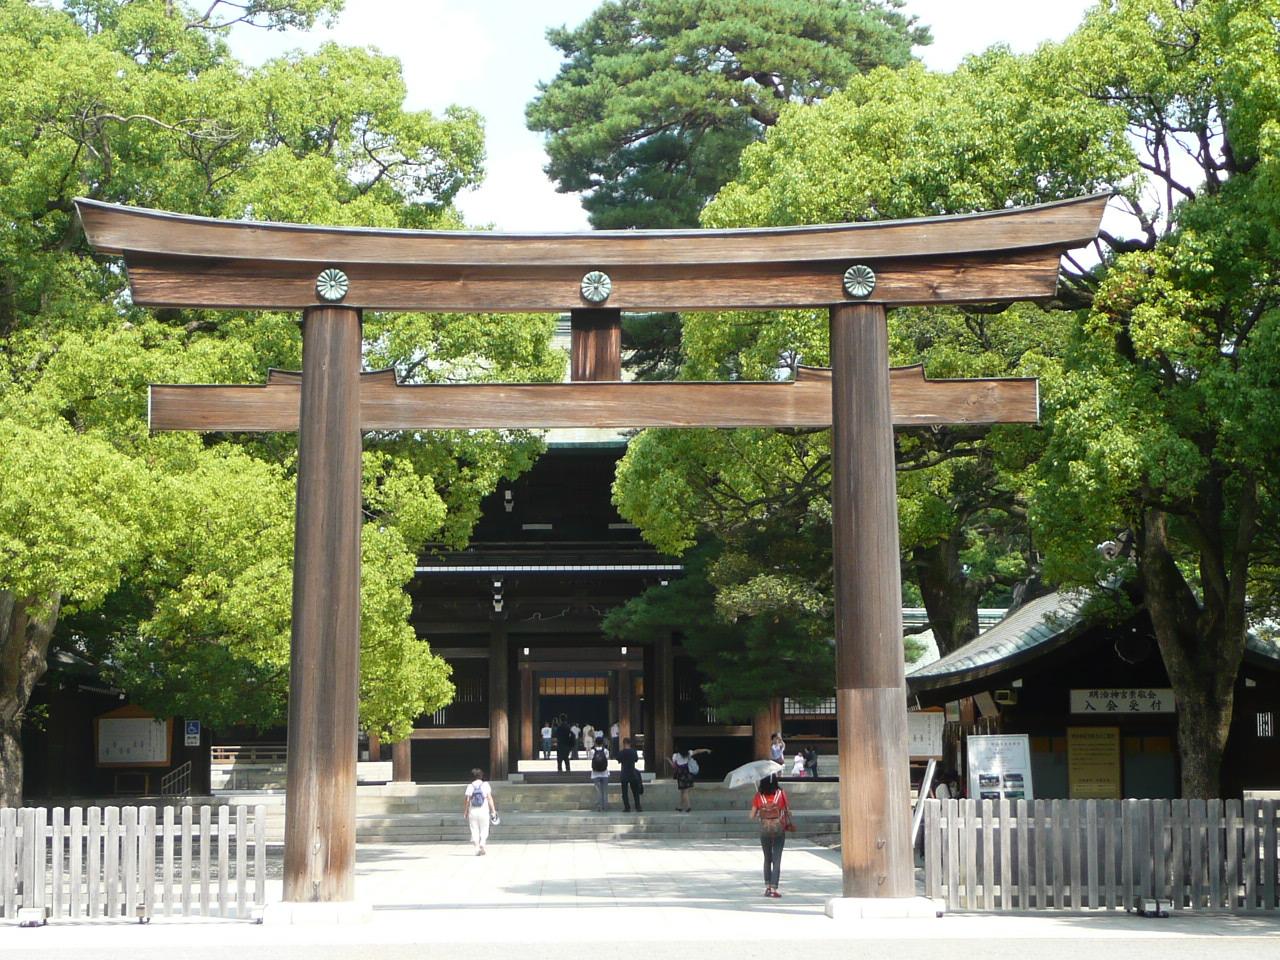 WEBS OF SIGNIFICANCE: Finally -- a visit to Meiji Jingu ...